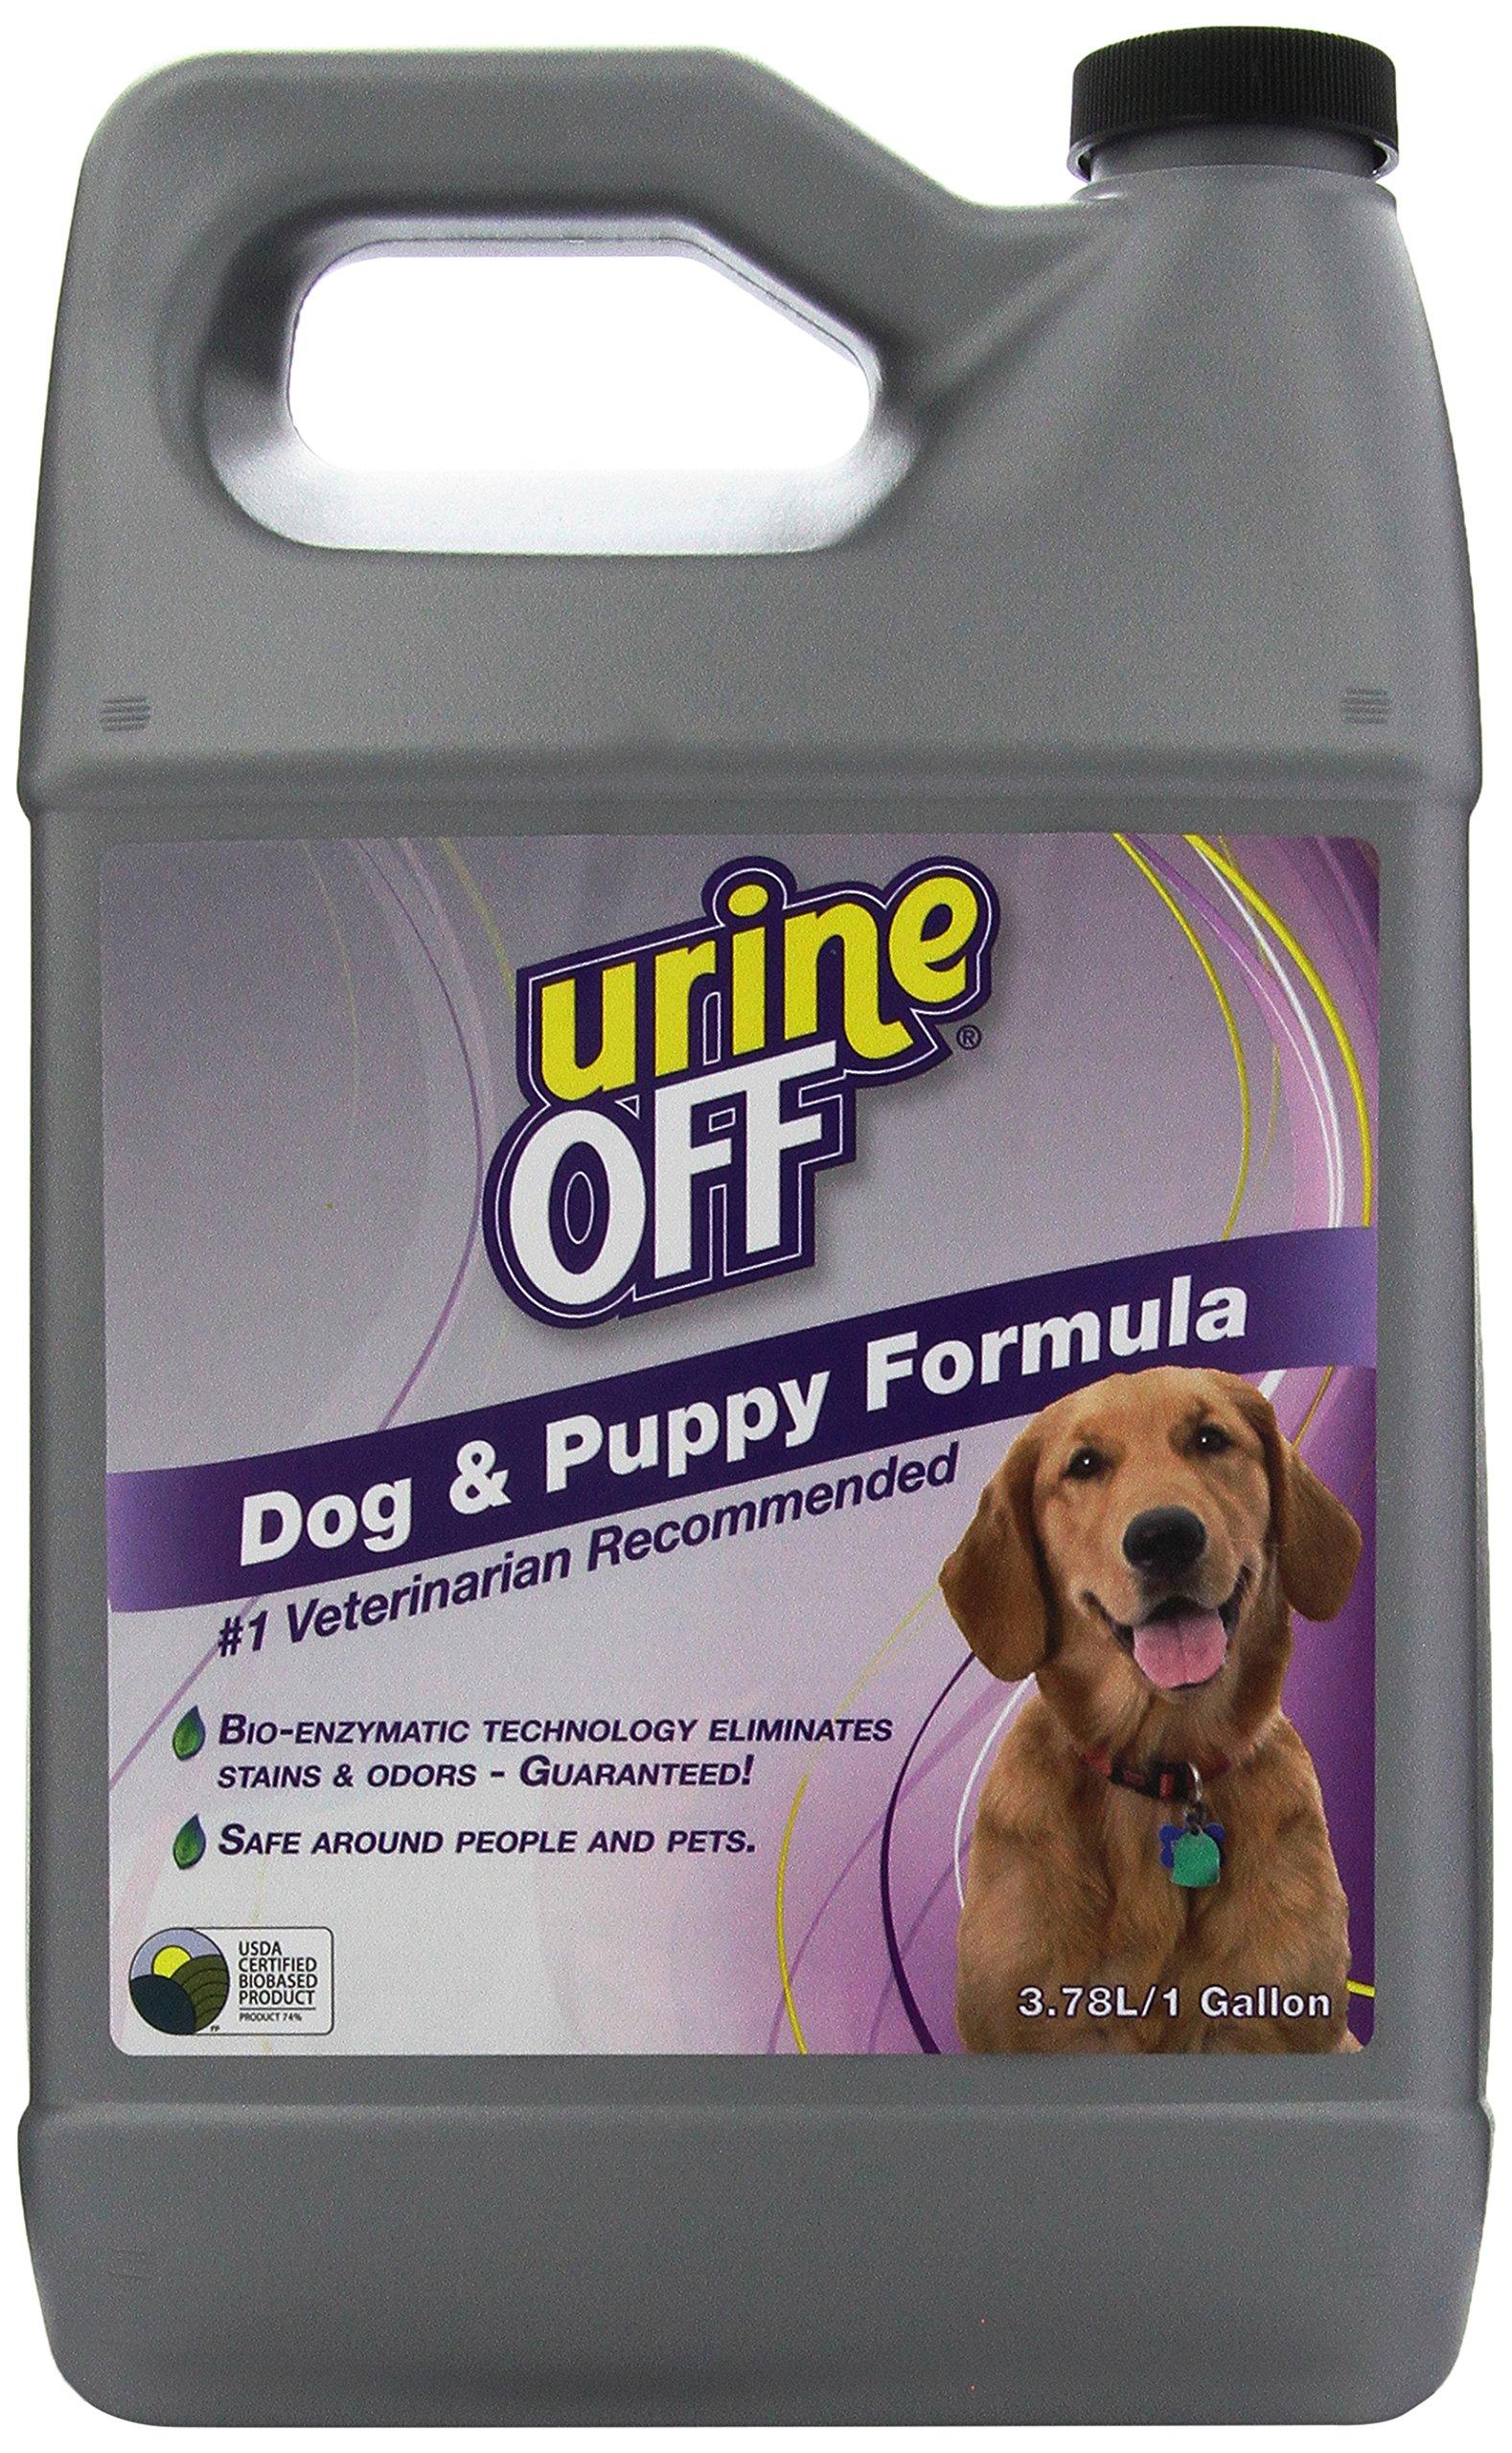 Urine Off Odor and Stain Remover Dog Formula, 1 Gallon